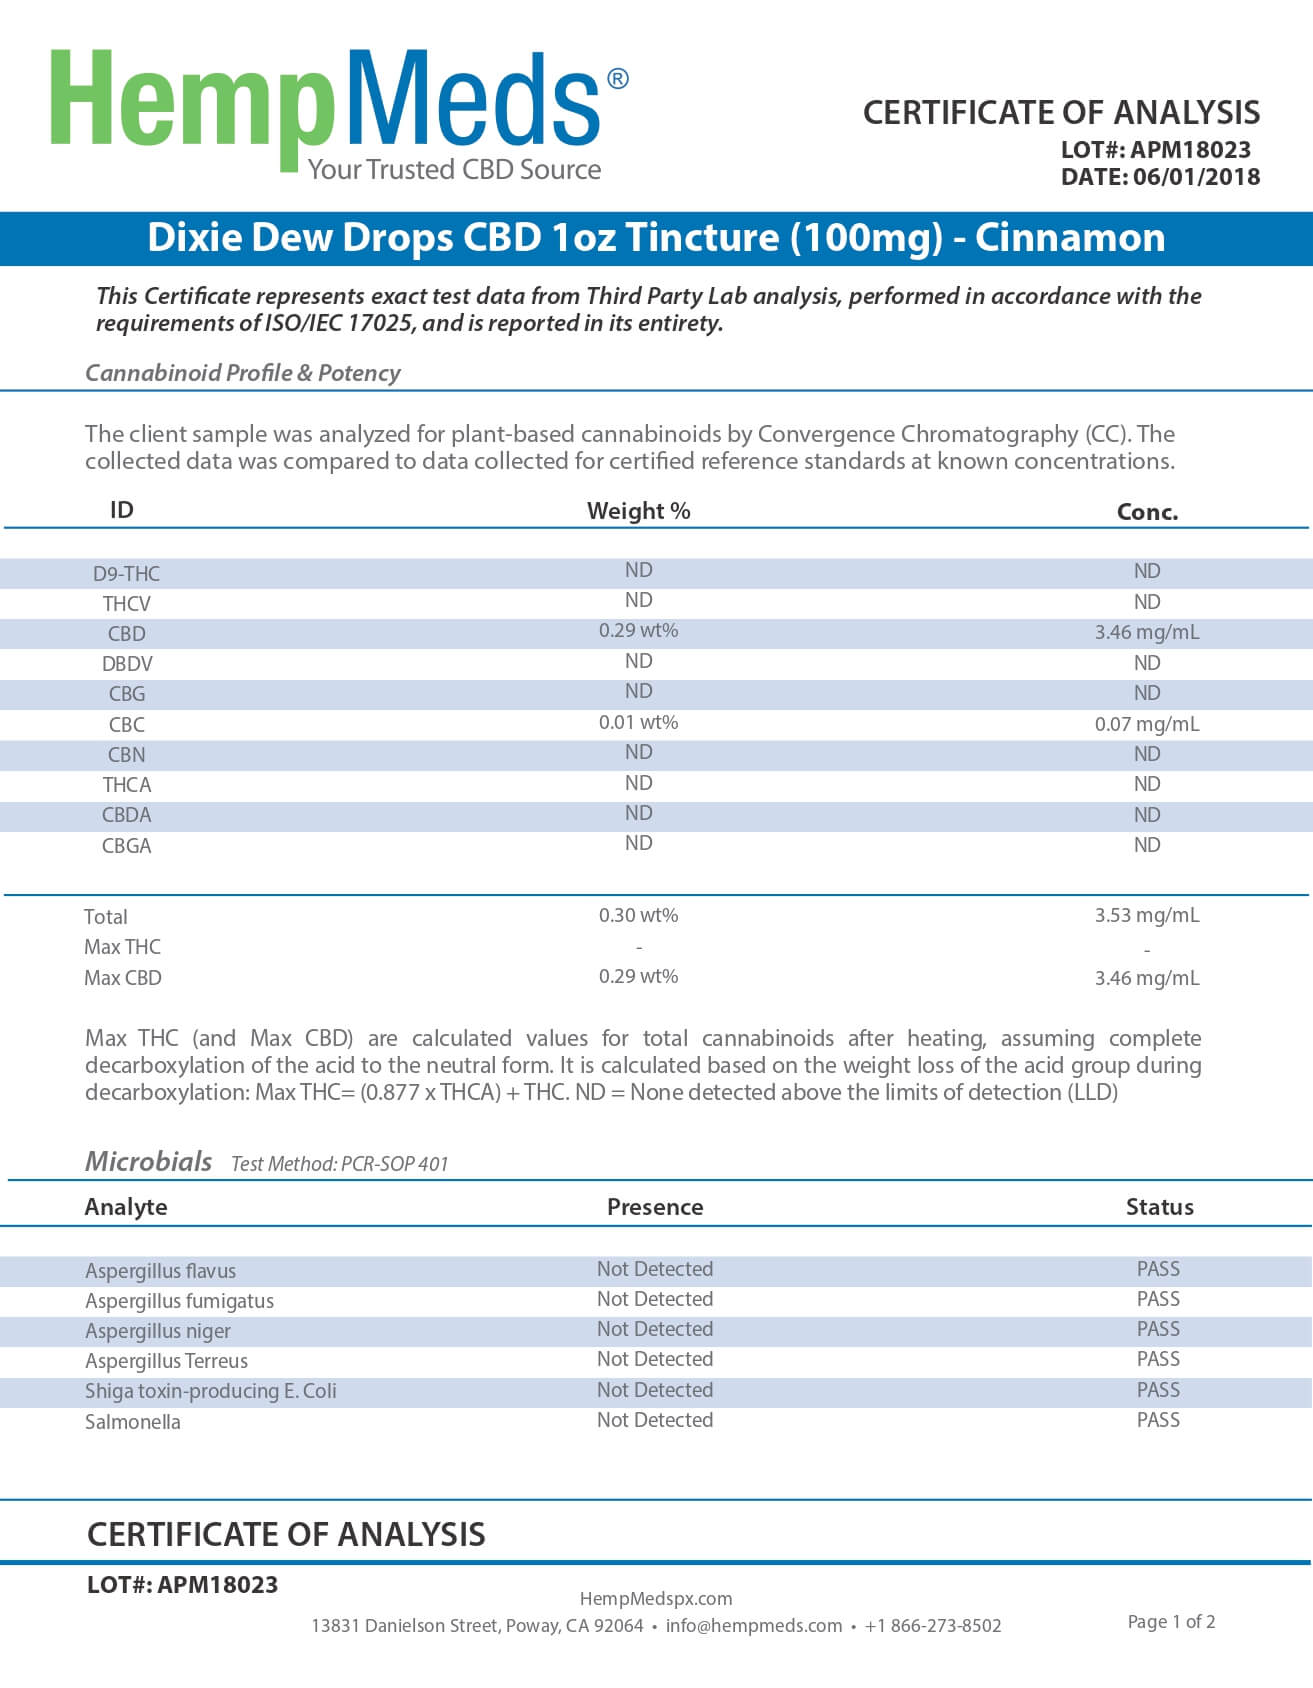 Dixie Botanicals CBD Tincture Cinnamon 1oz Dew Drops 100mg Lab Report